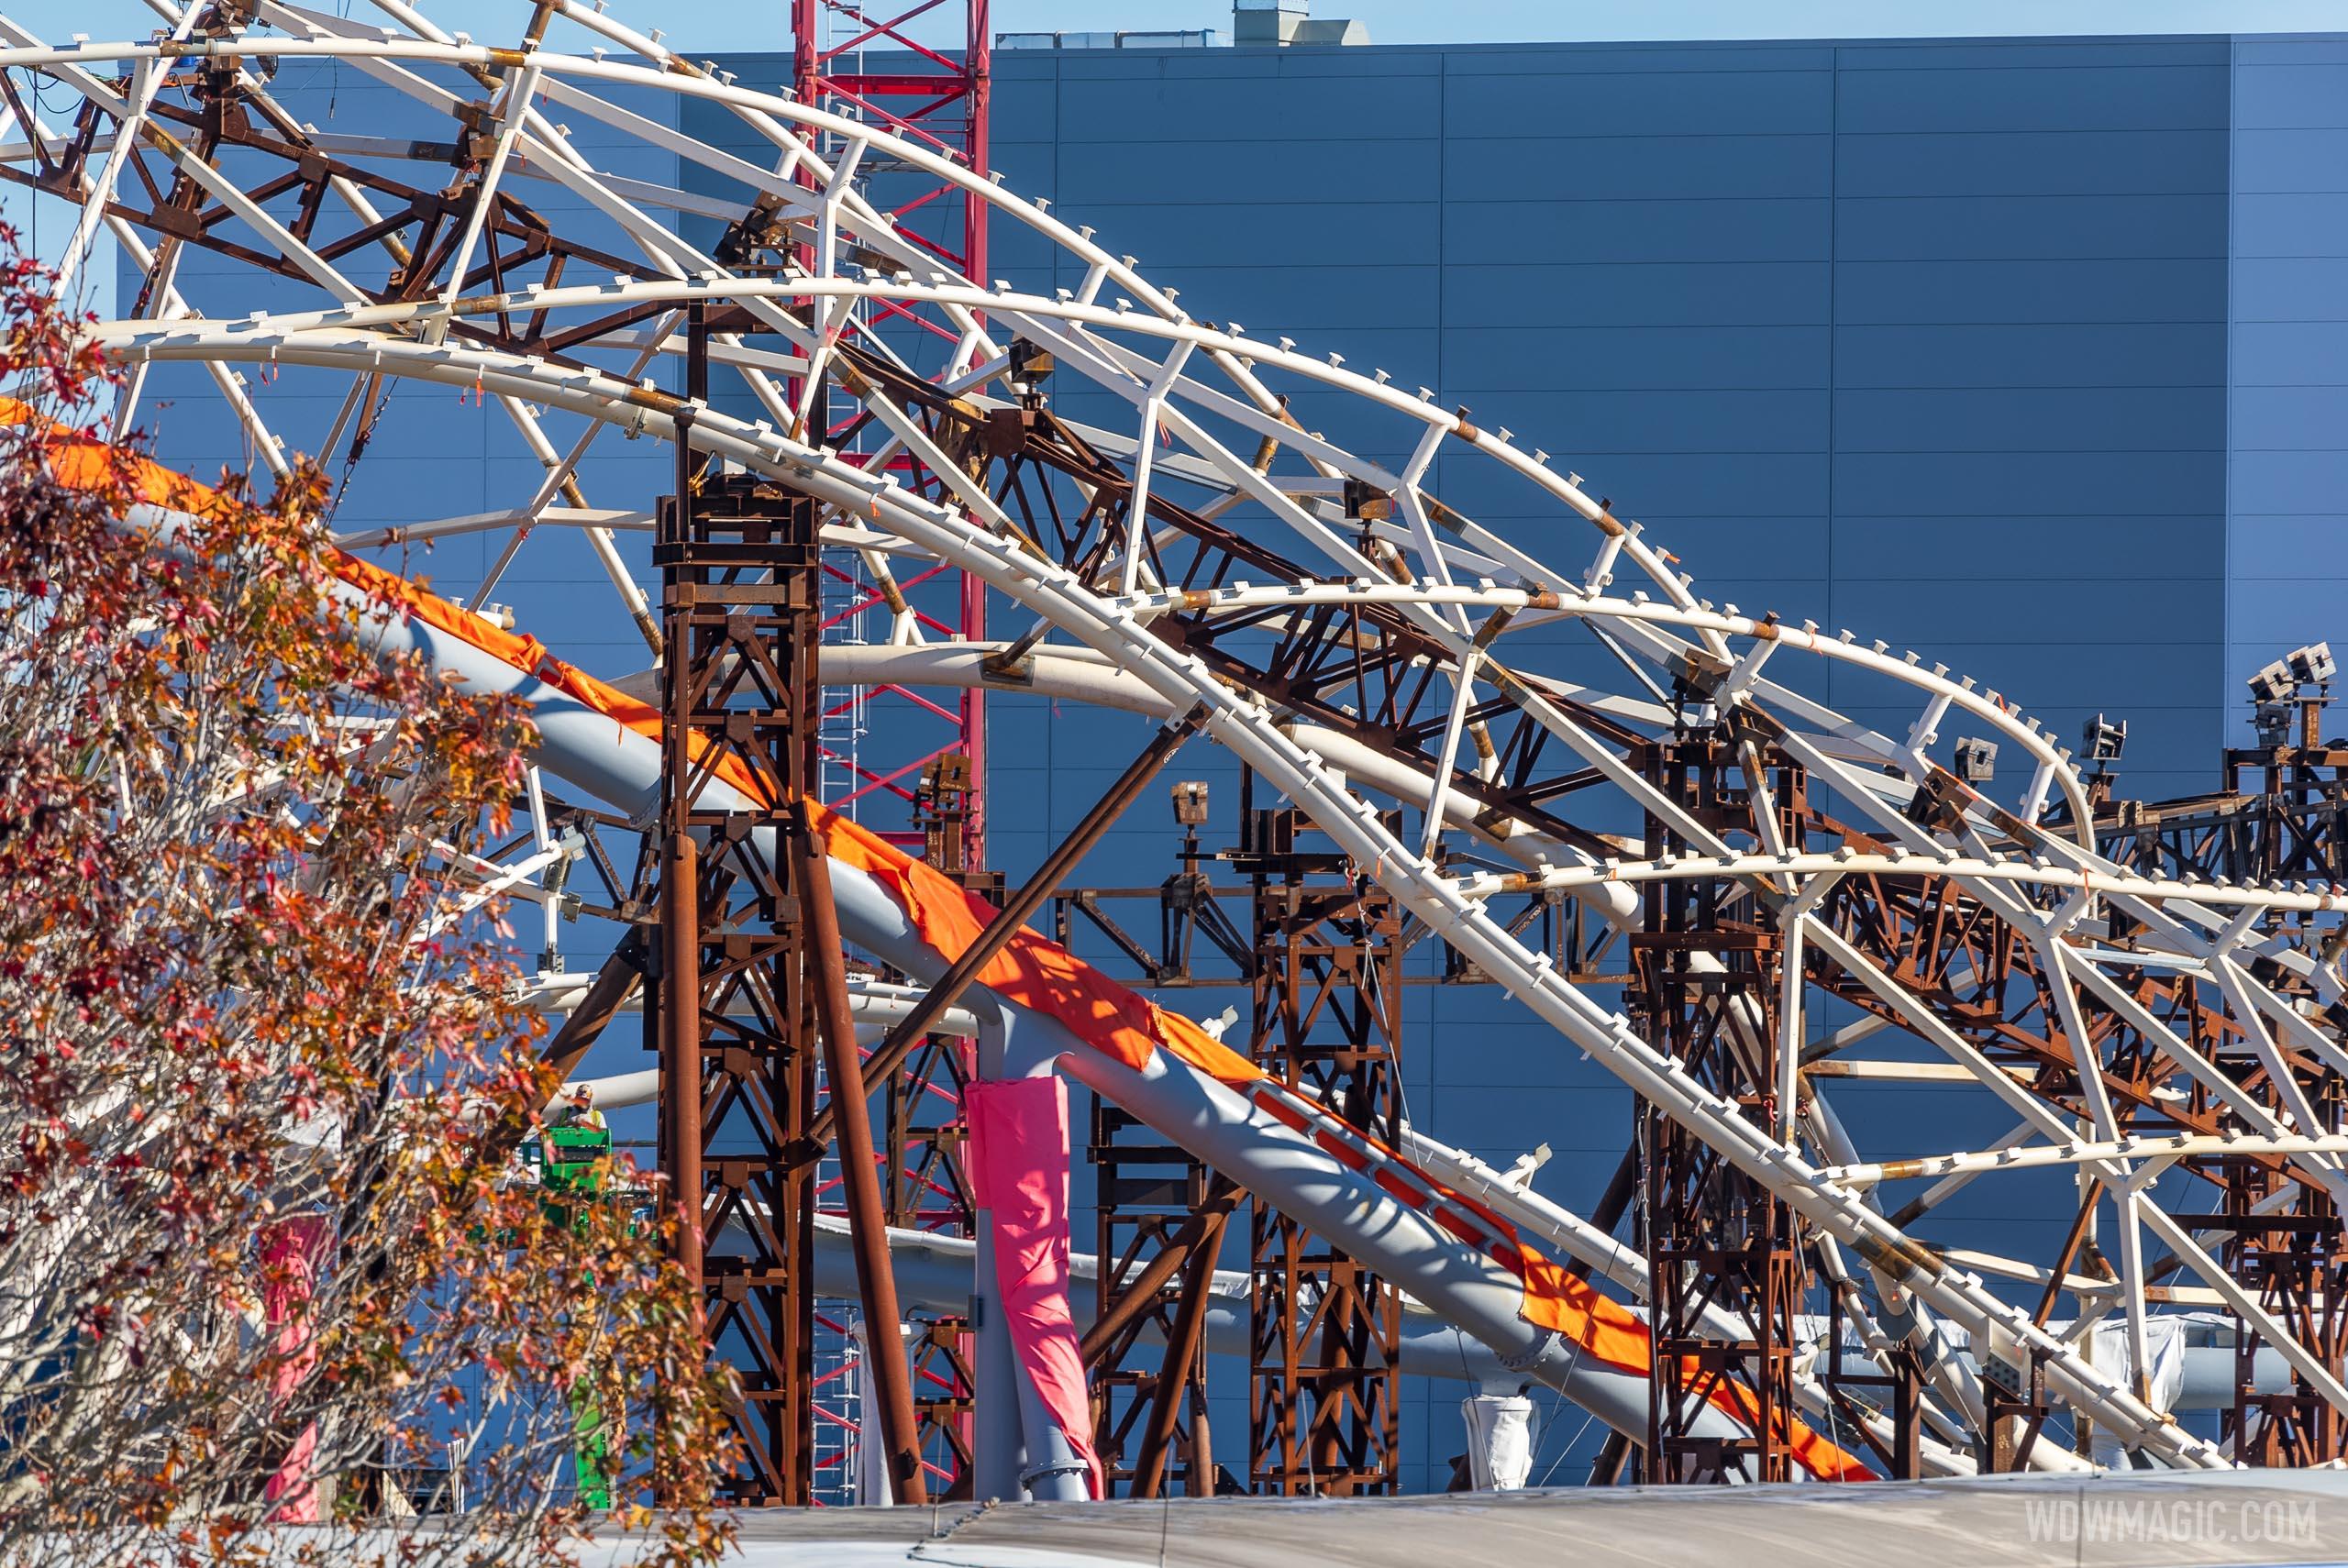 TRON Lightcycle Run construction - January 4 2021